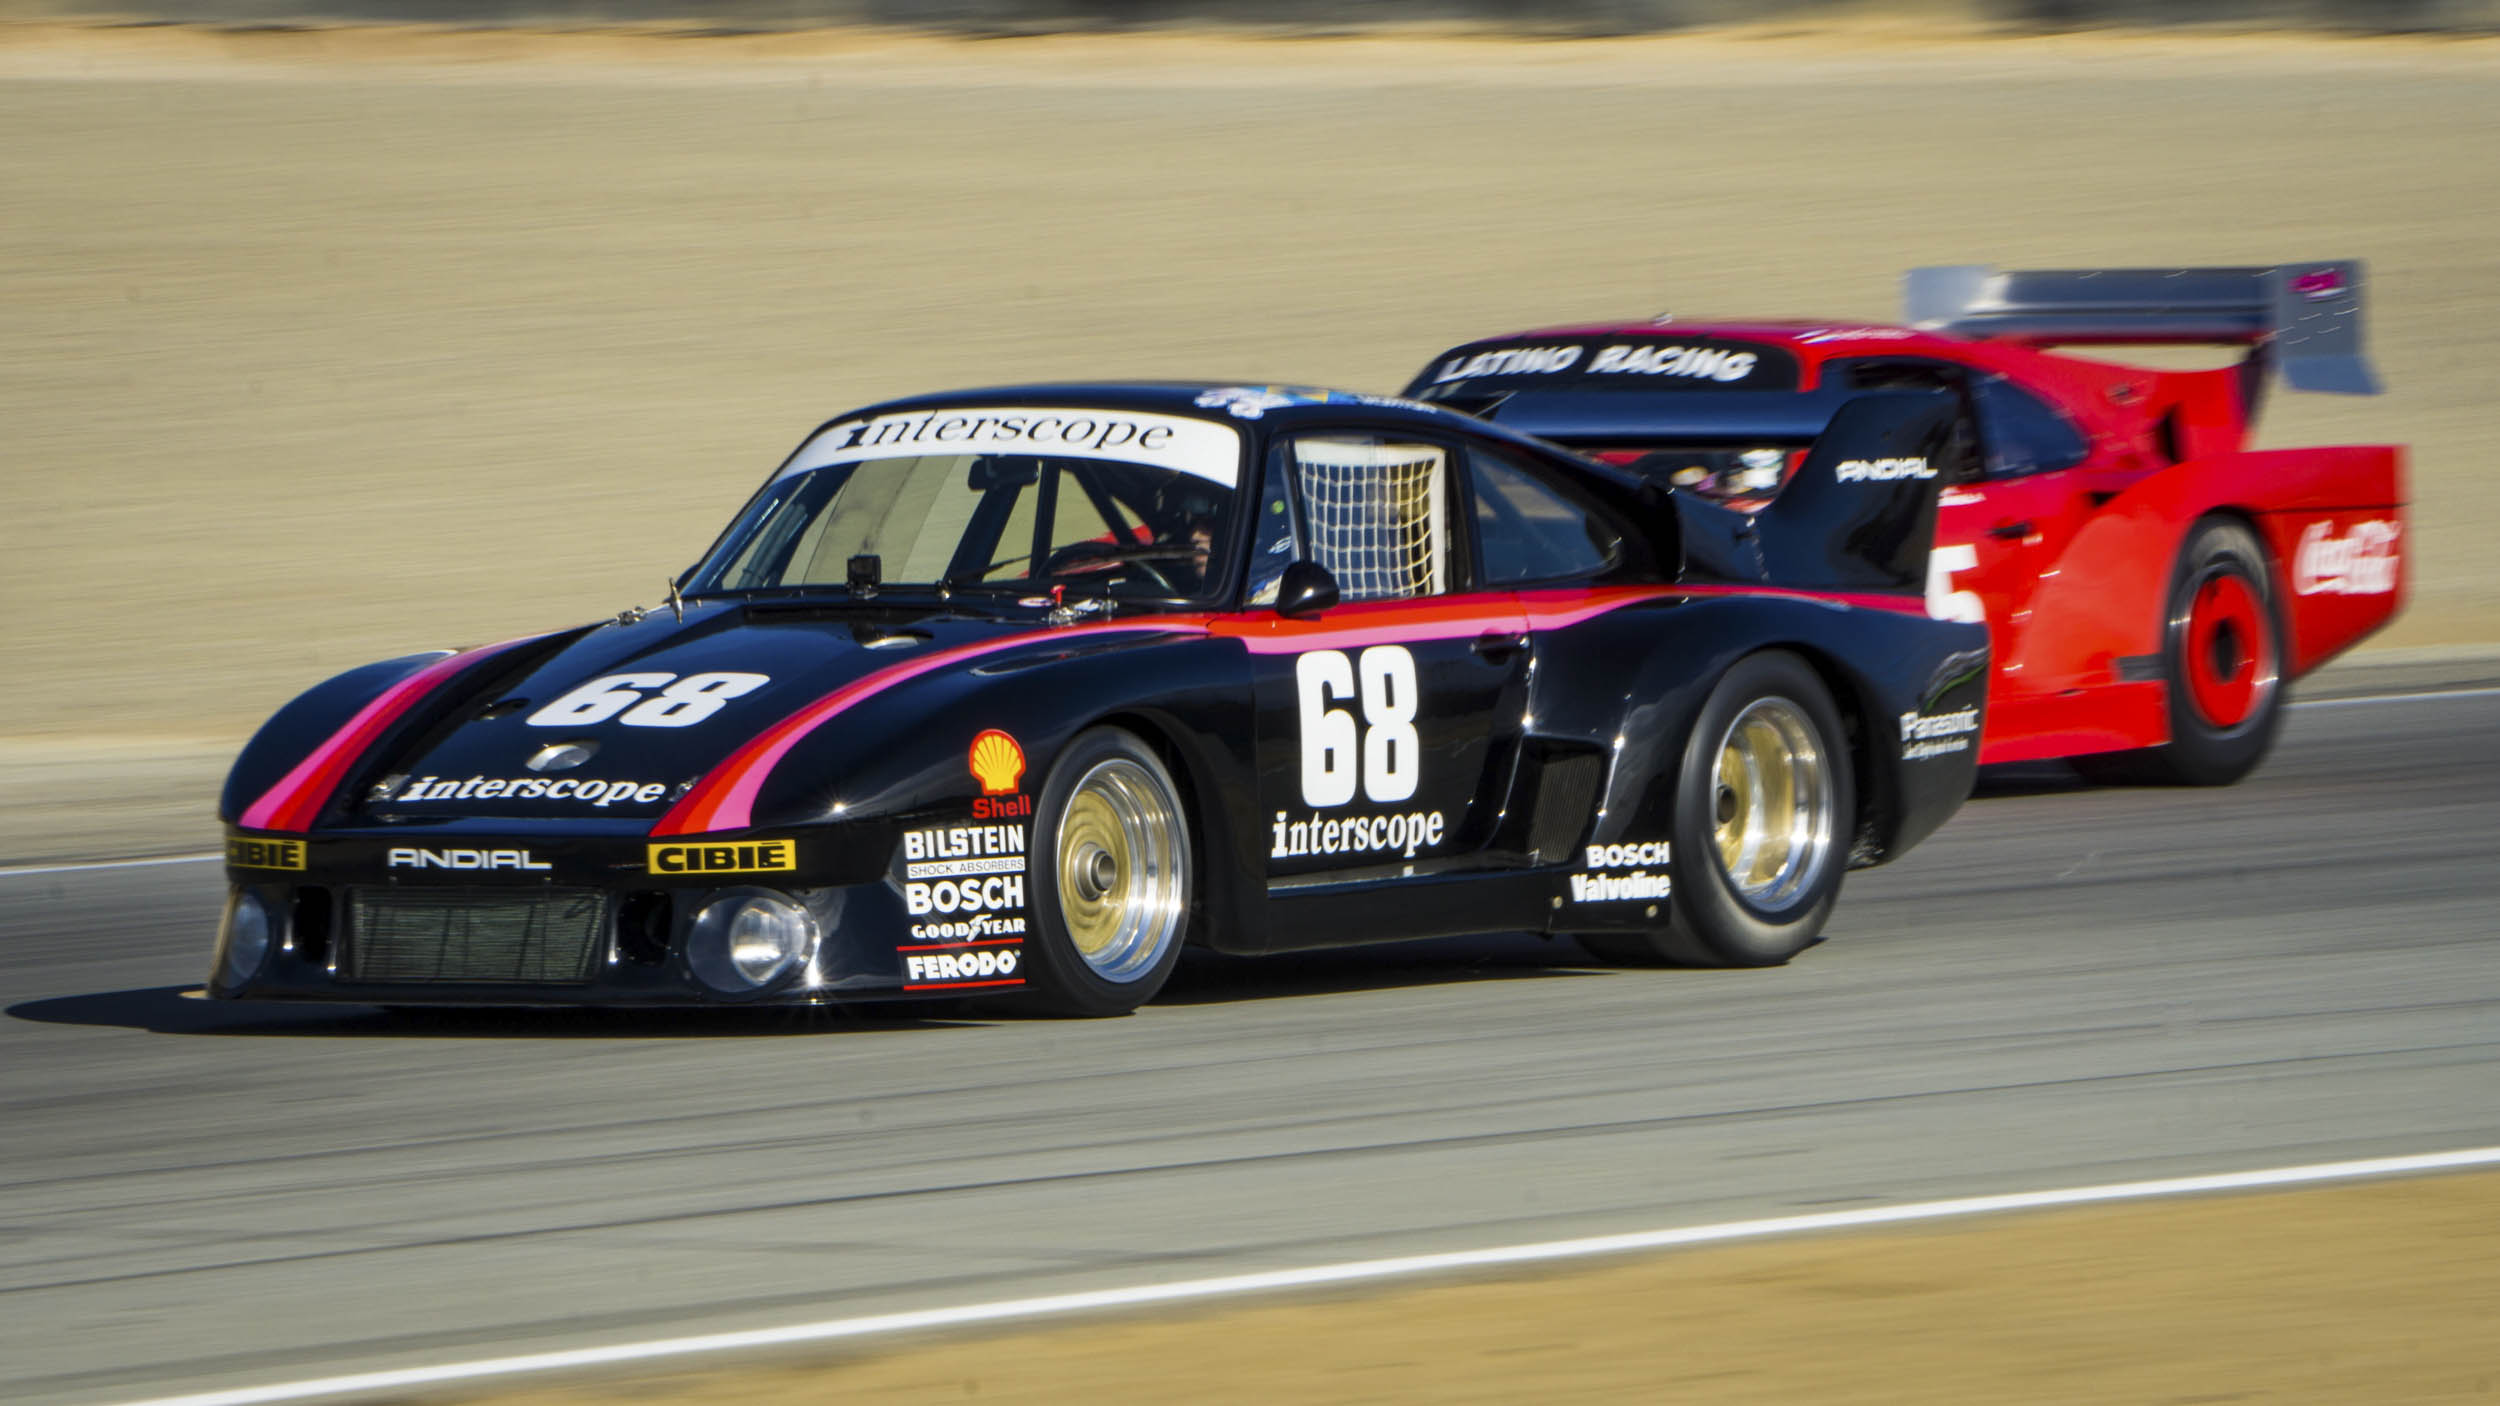 Lloyd Hawkins's 1979 Porsche 935